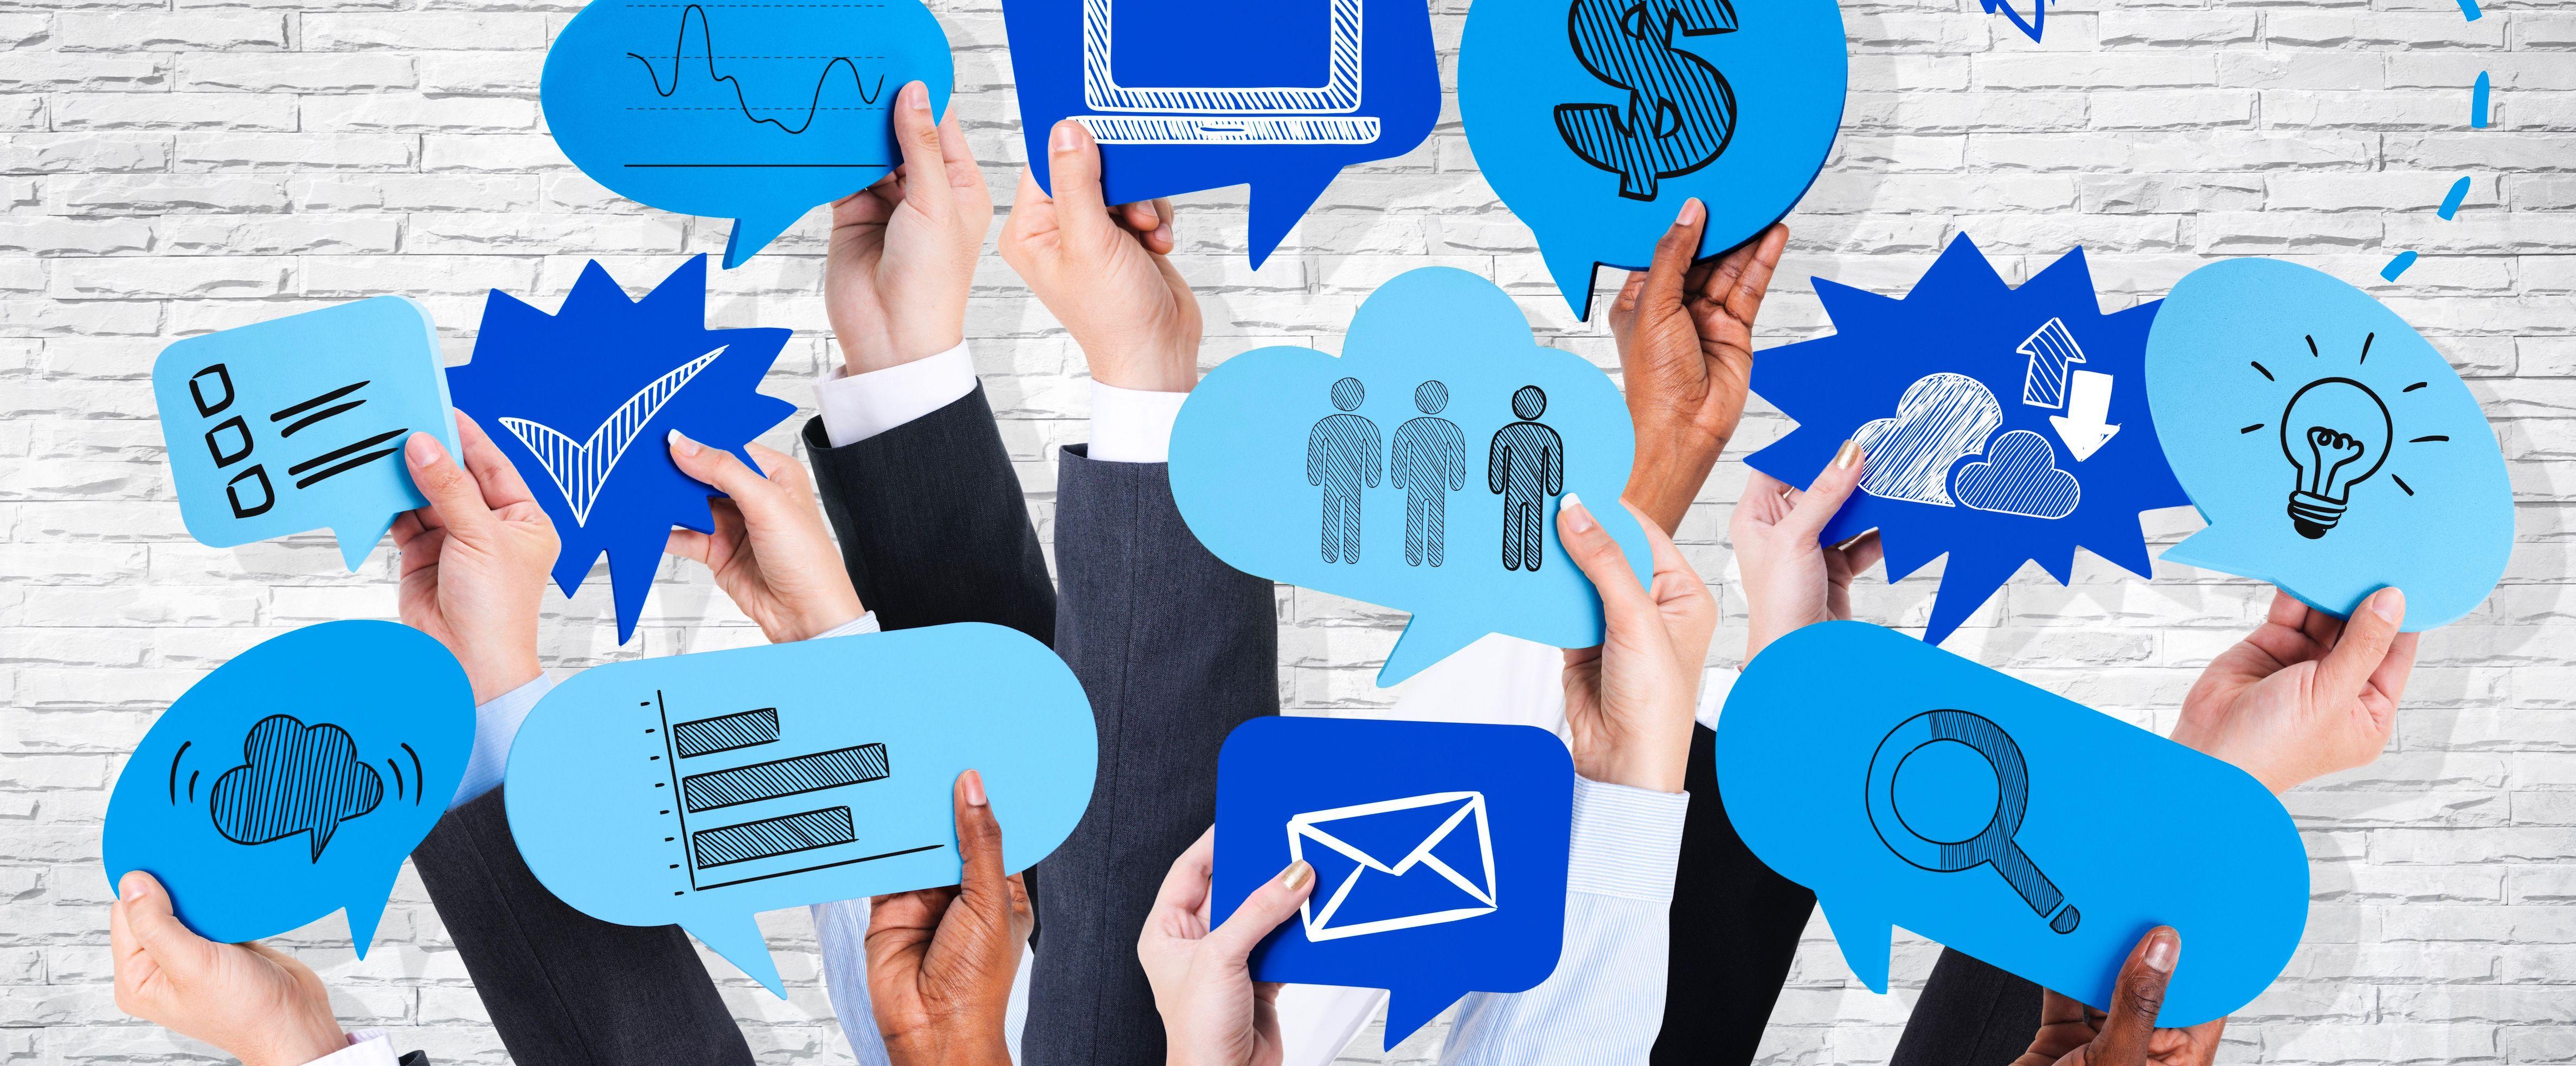 How to Build A Social Media Strategy Dream Team [Free Ebook]